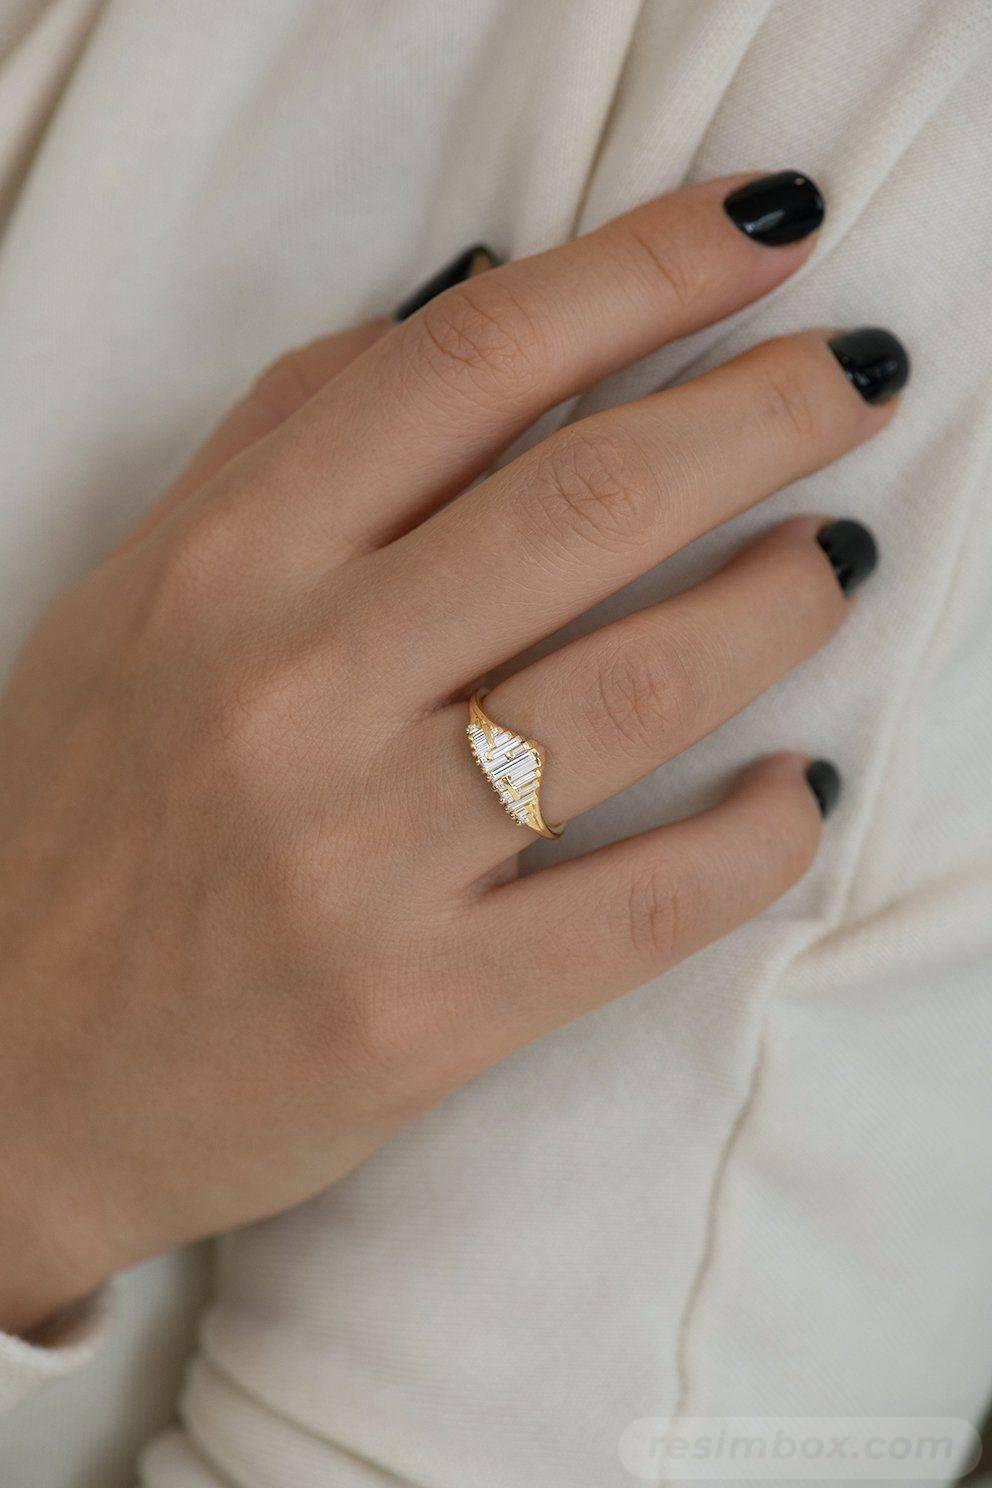 Art deco engagement ring-256705247498386782